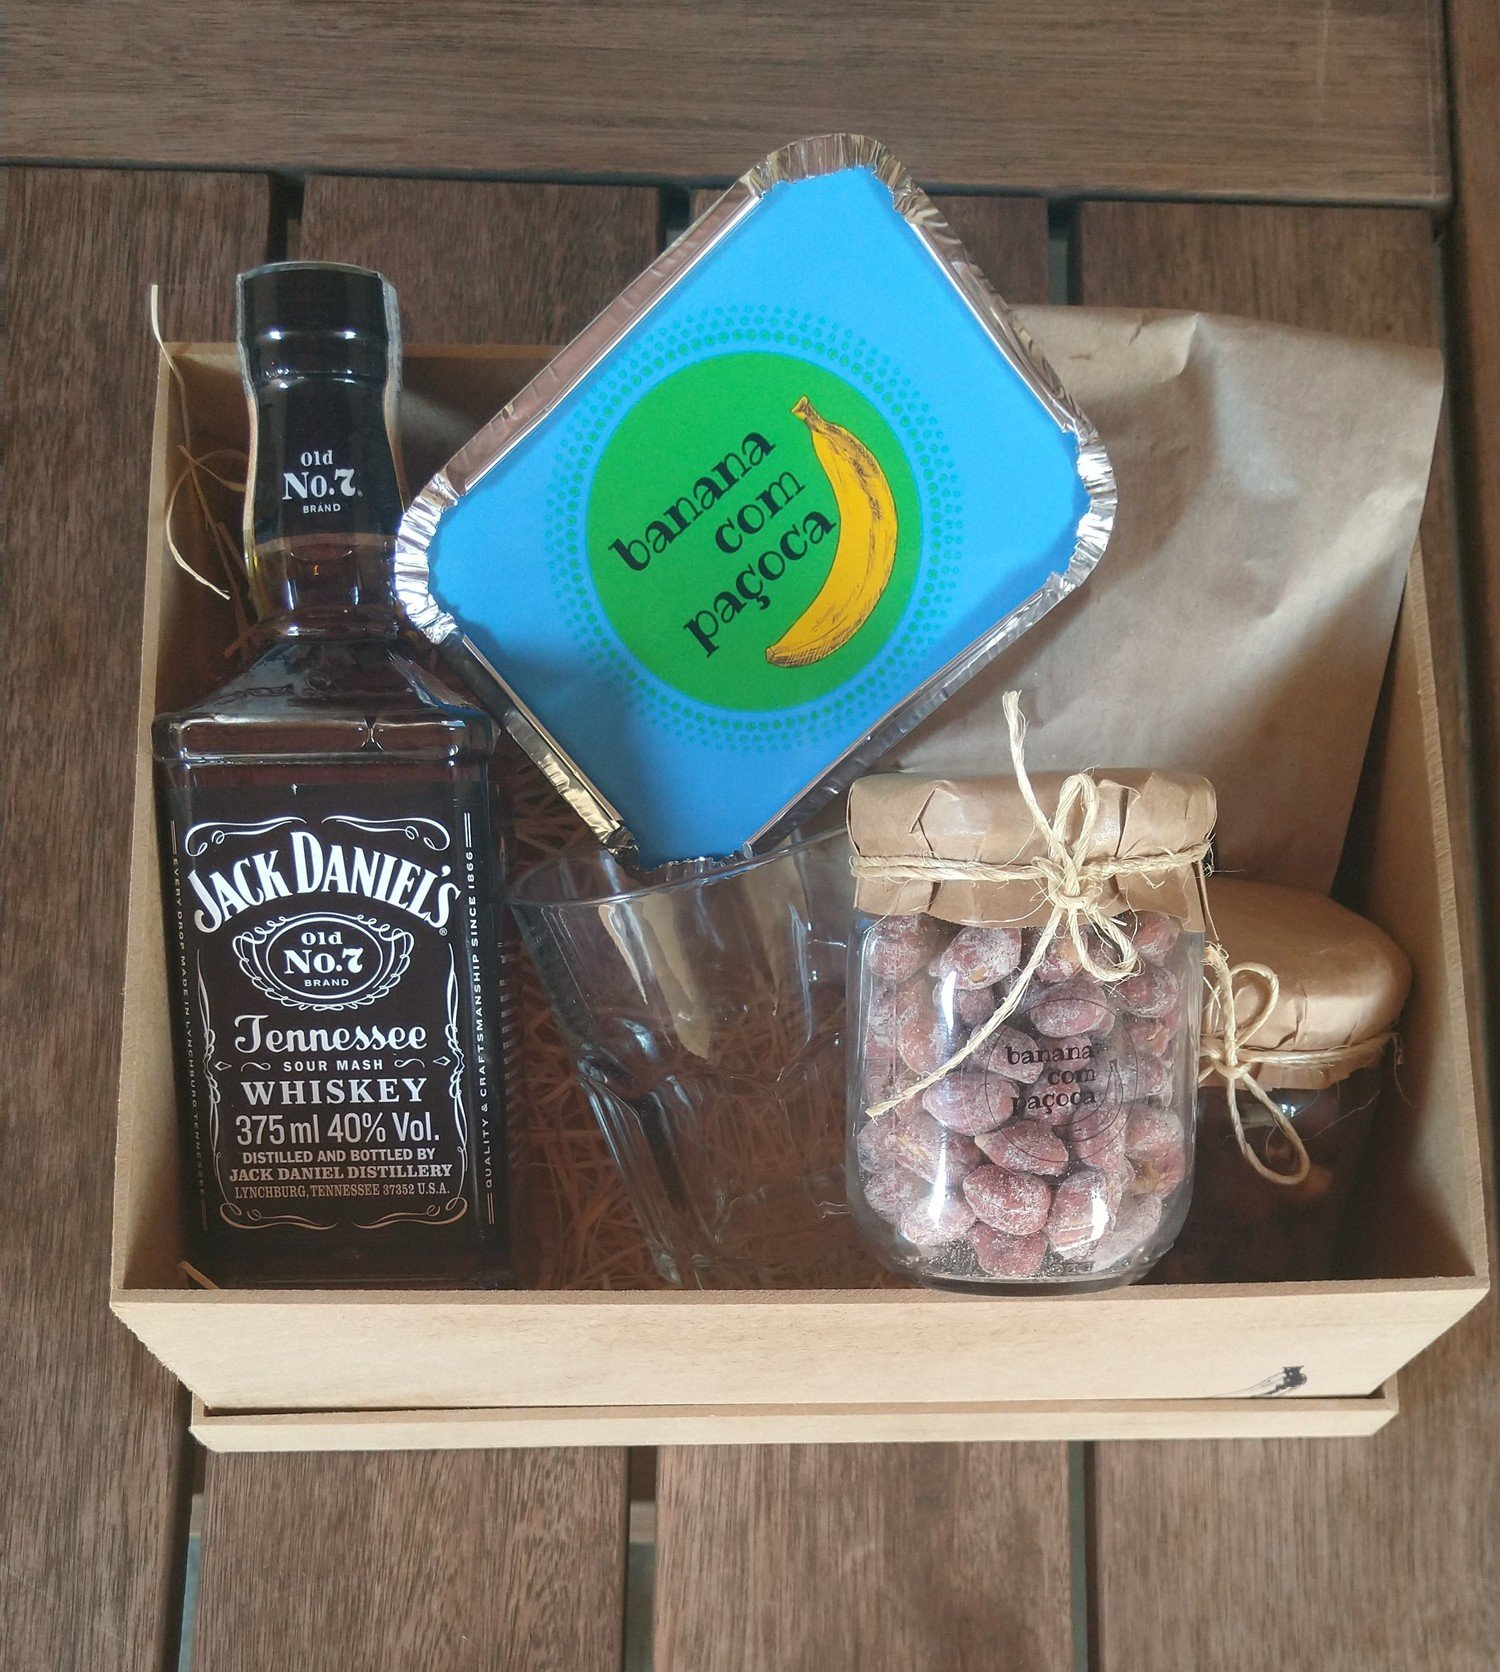 Kit Whisky in the Jar -  brigadeiros amendoim paçoca garrafa de whisky